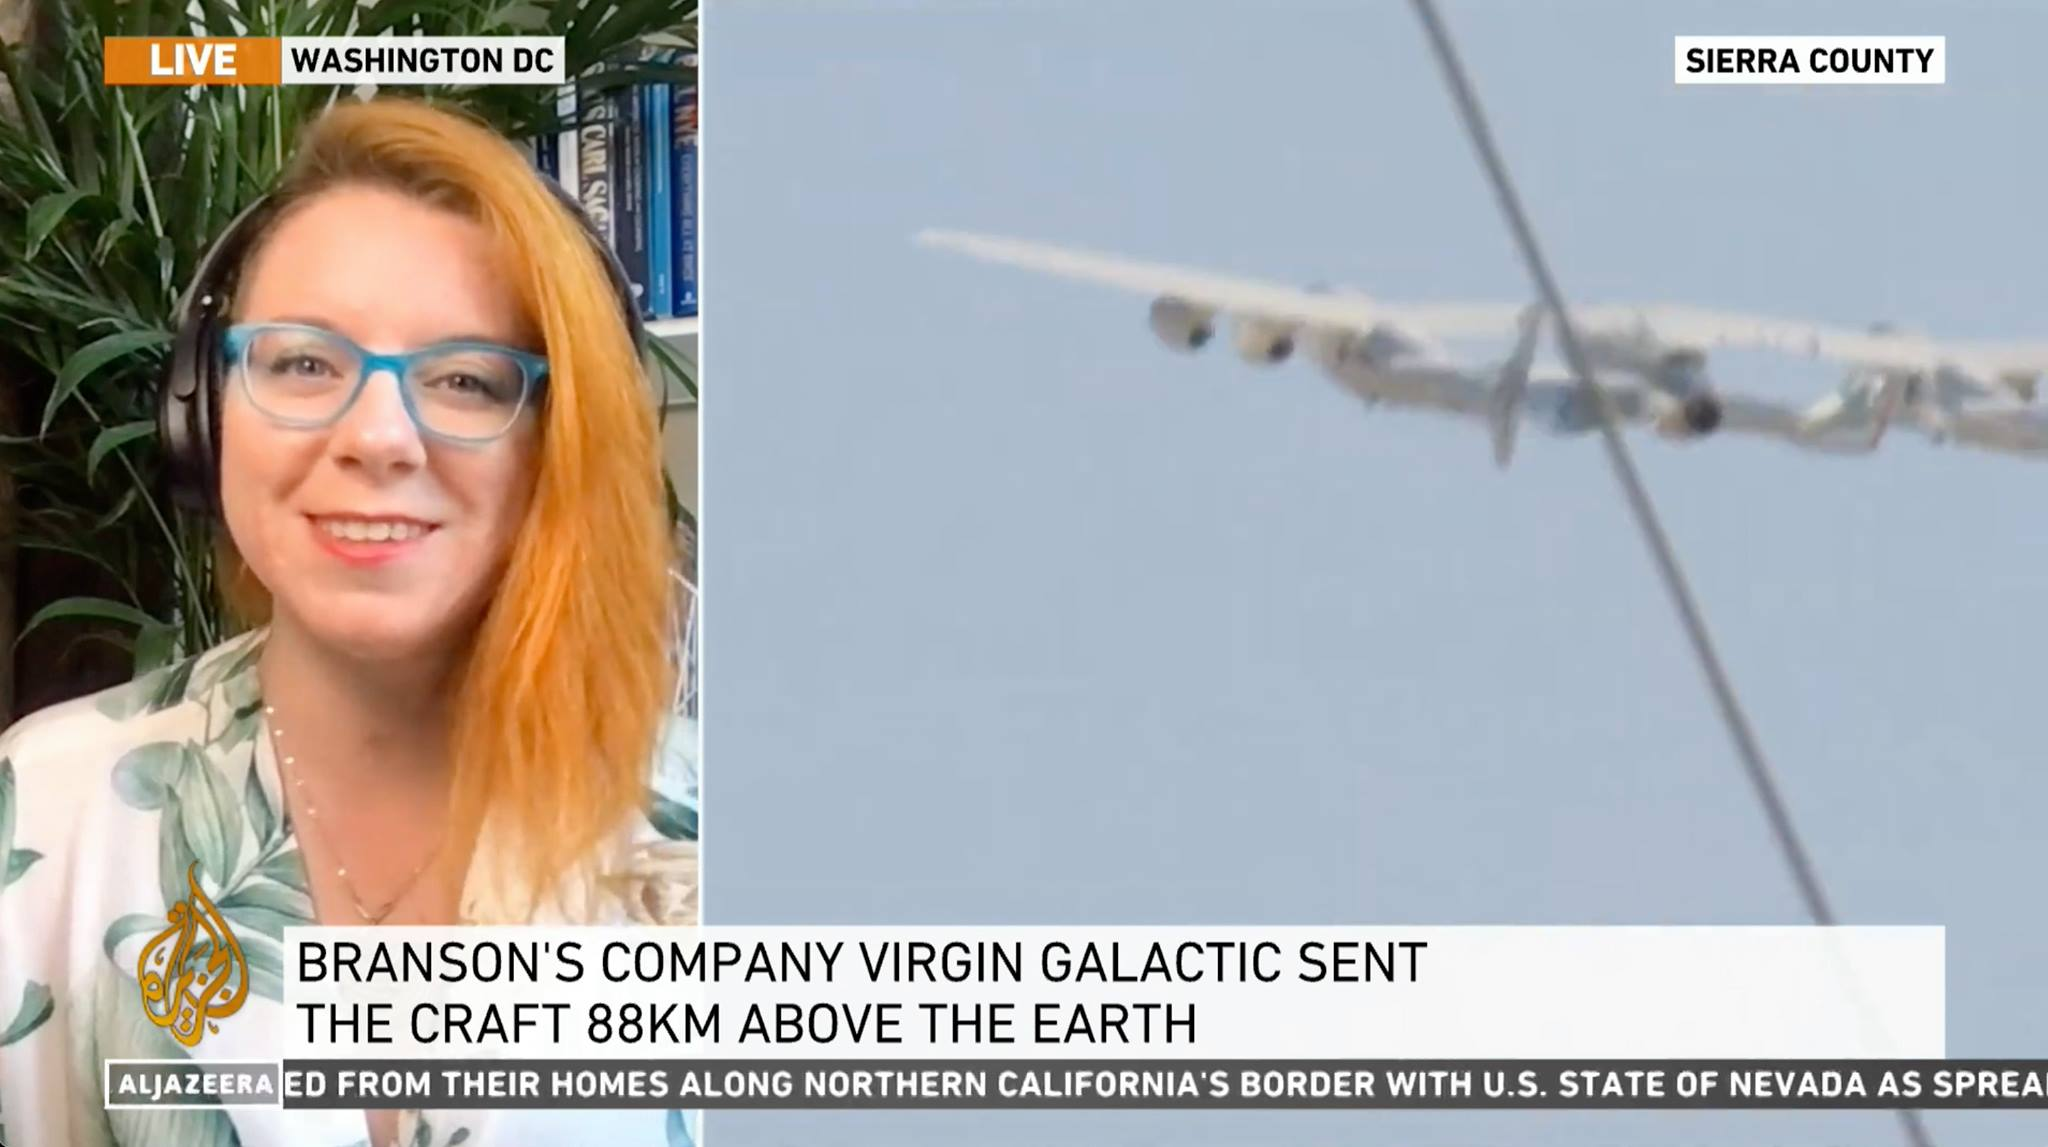 Dr. Tanya Harrison discusses the Virgin Galactic Unity 22 flight on Al Jazeera English